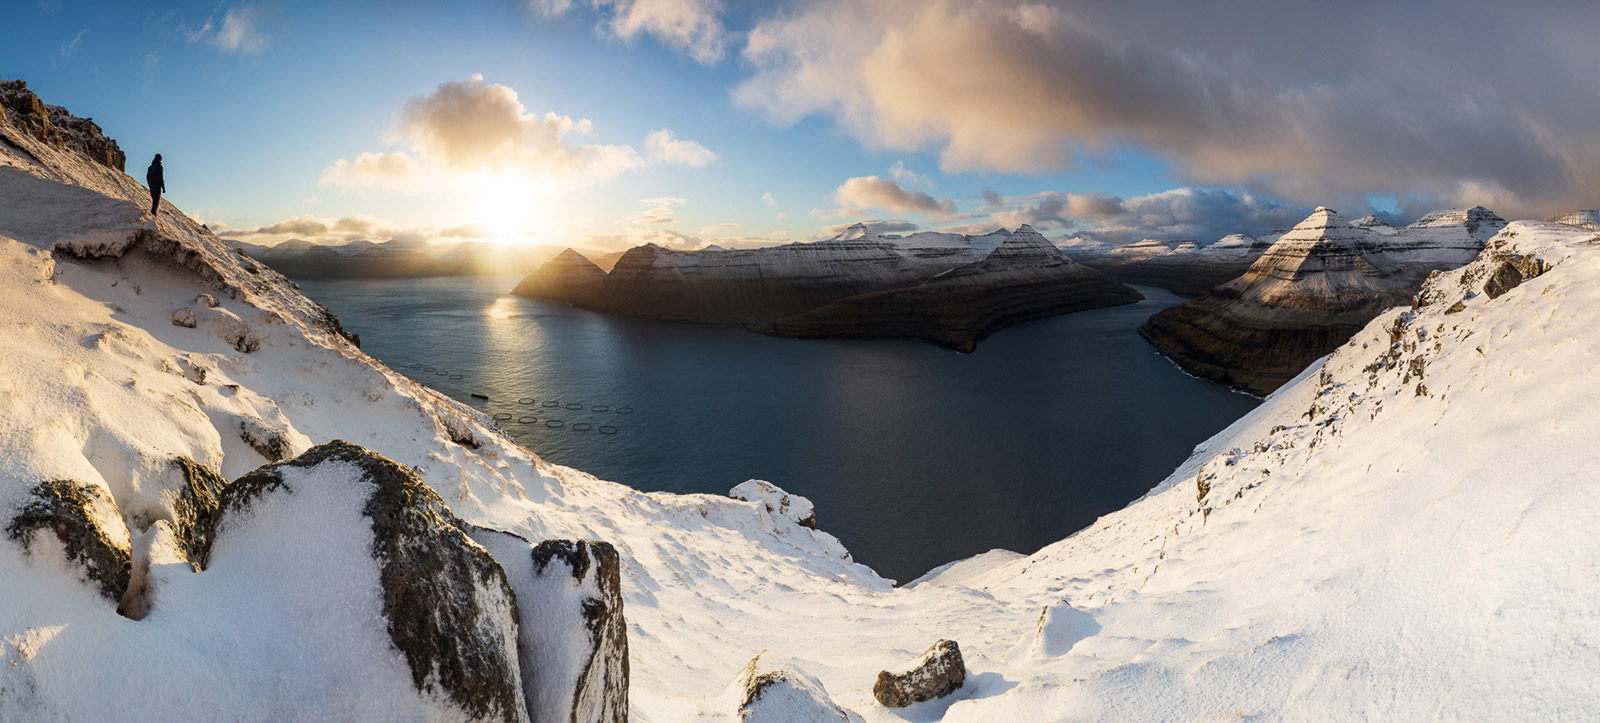 Färöer Inseln Panorama - Stefan Schäfer Landschaftsfotograf